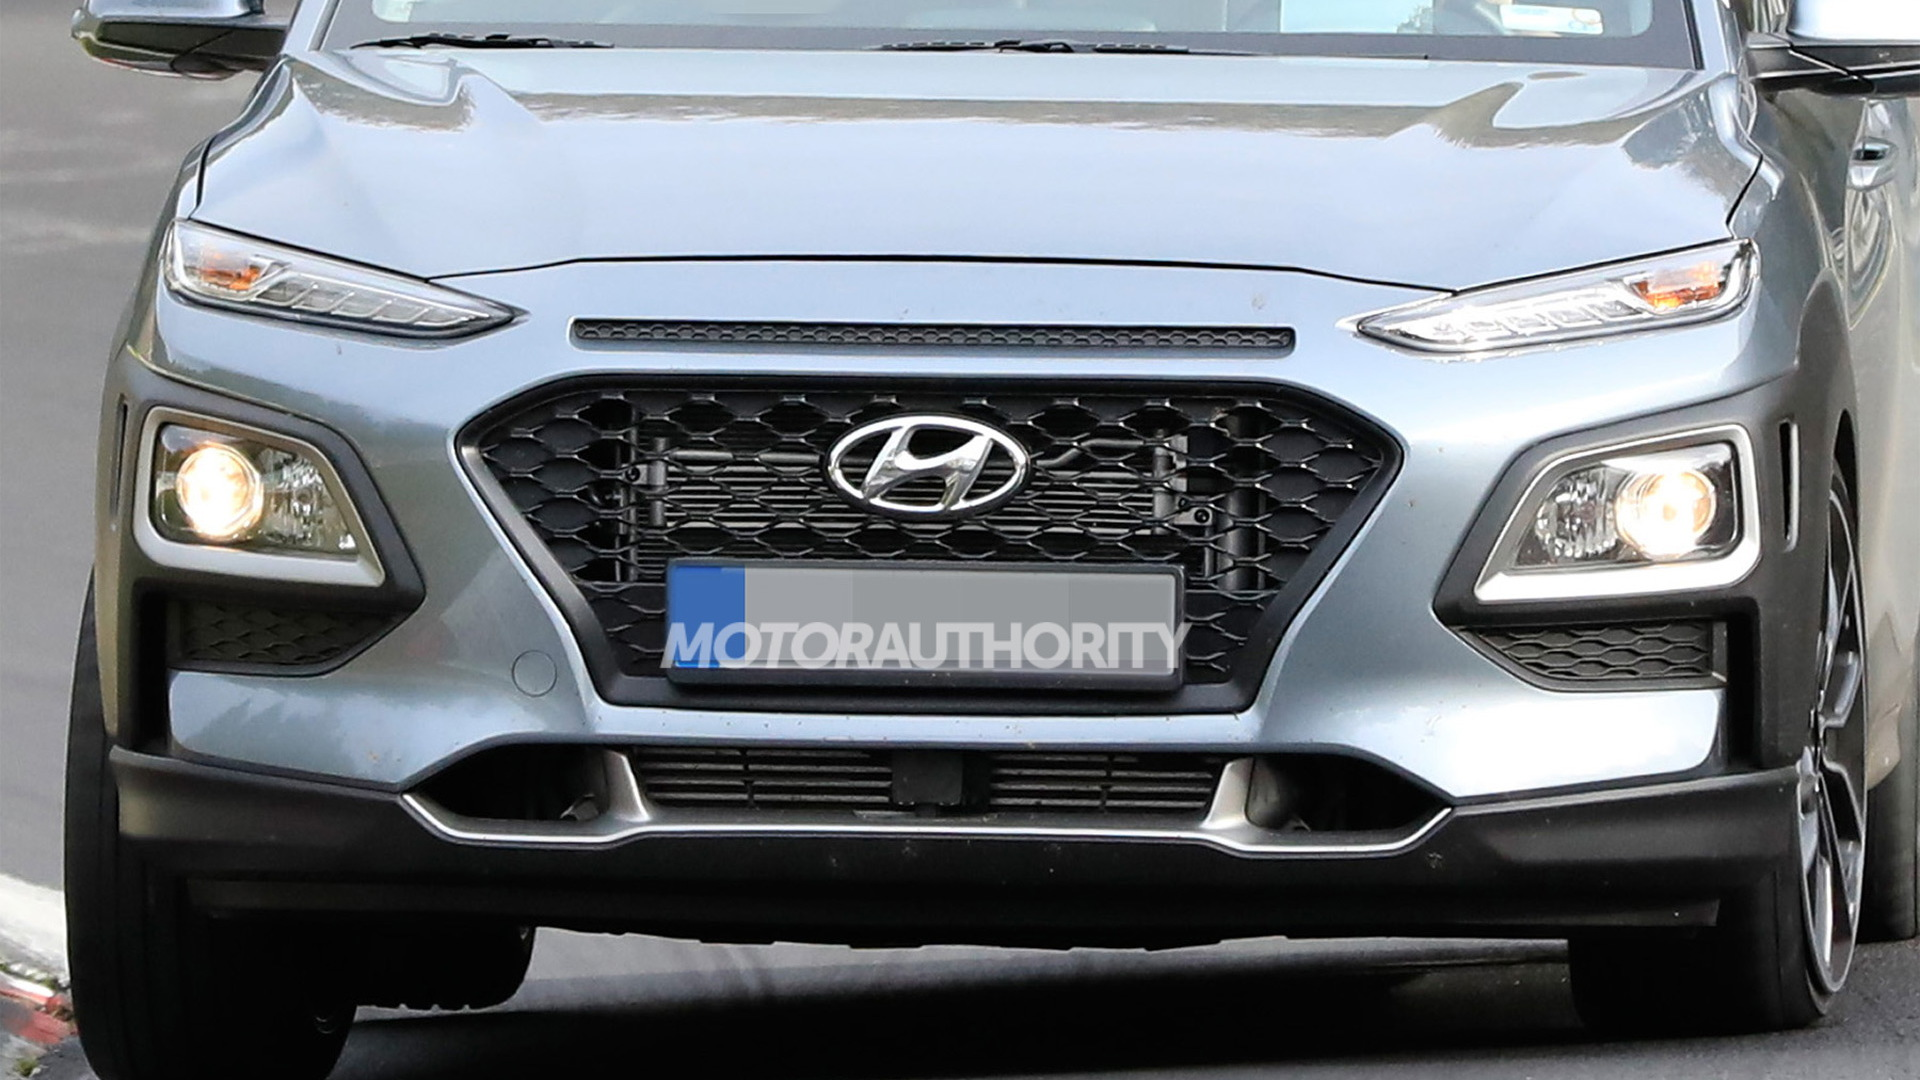 2022 Hyundai Kona N test mule spy shots - Photo credit: S. Baldauf/SB-Medien